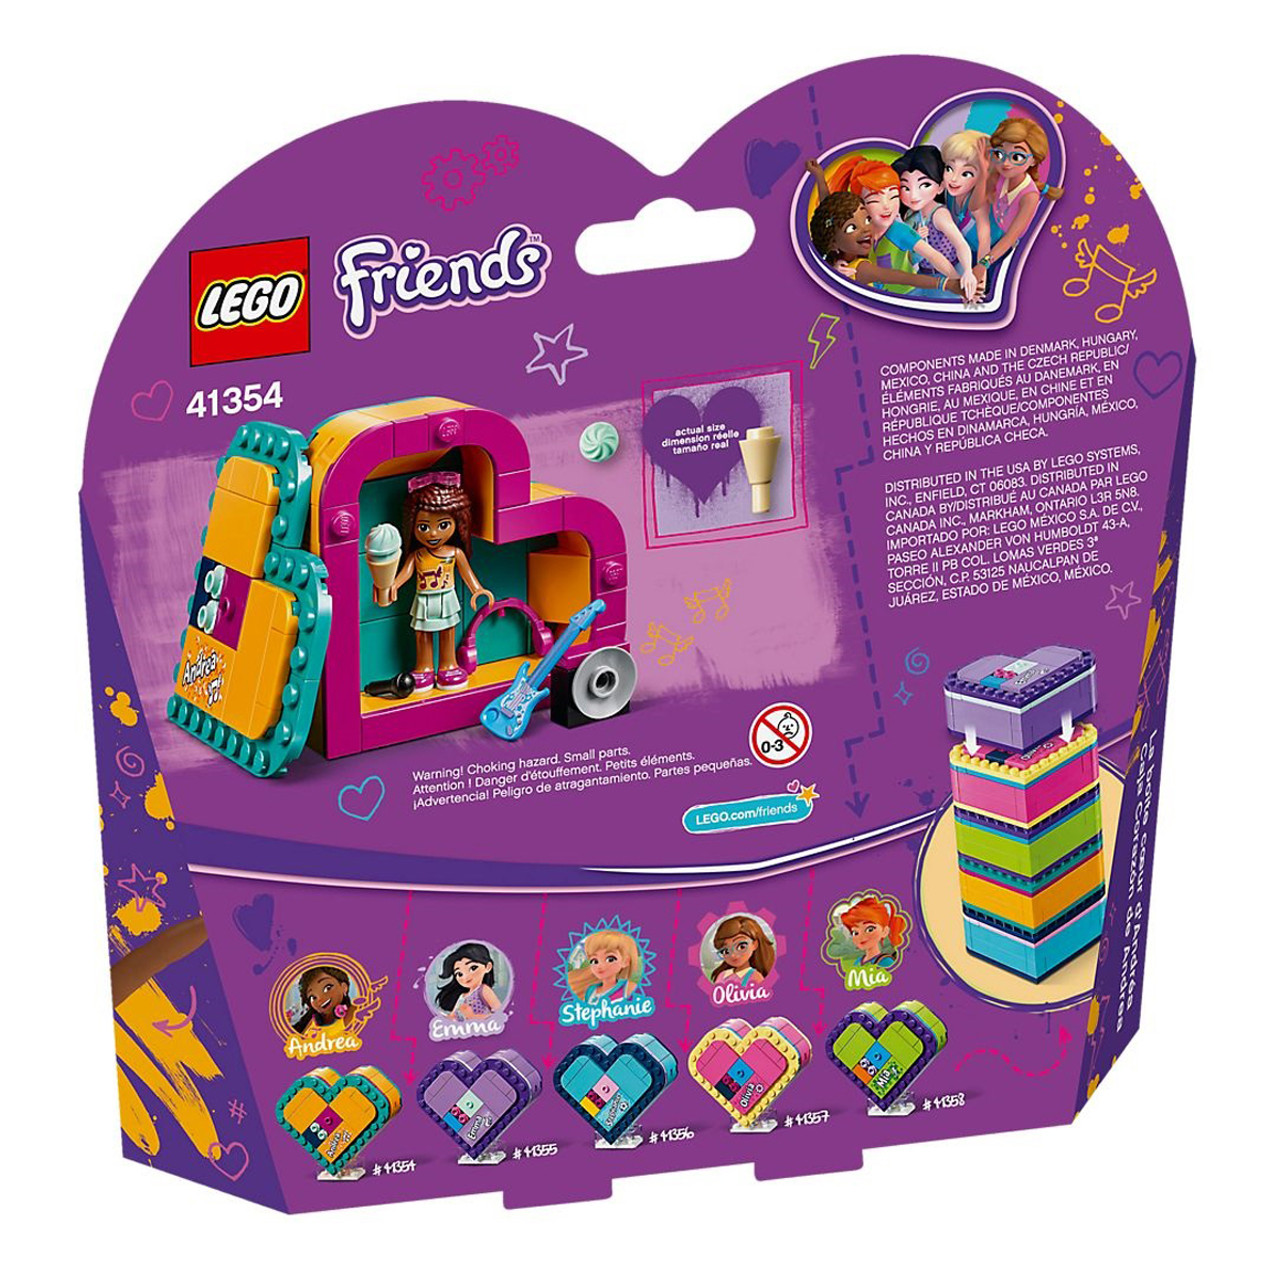 Lego Friends 41354 Andreas Heart Box Purple Turtle Toys Australia